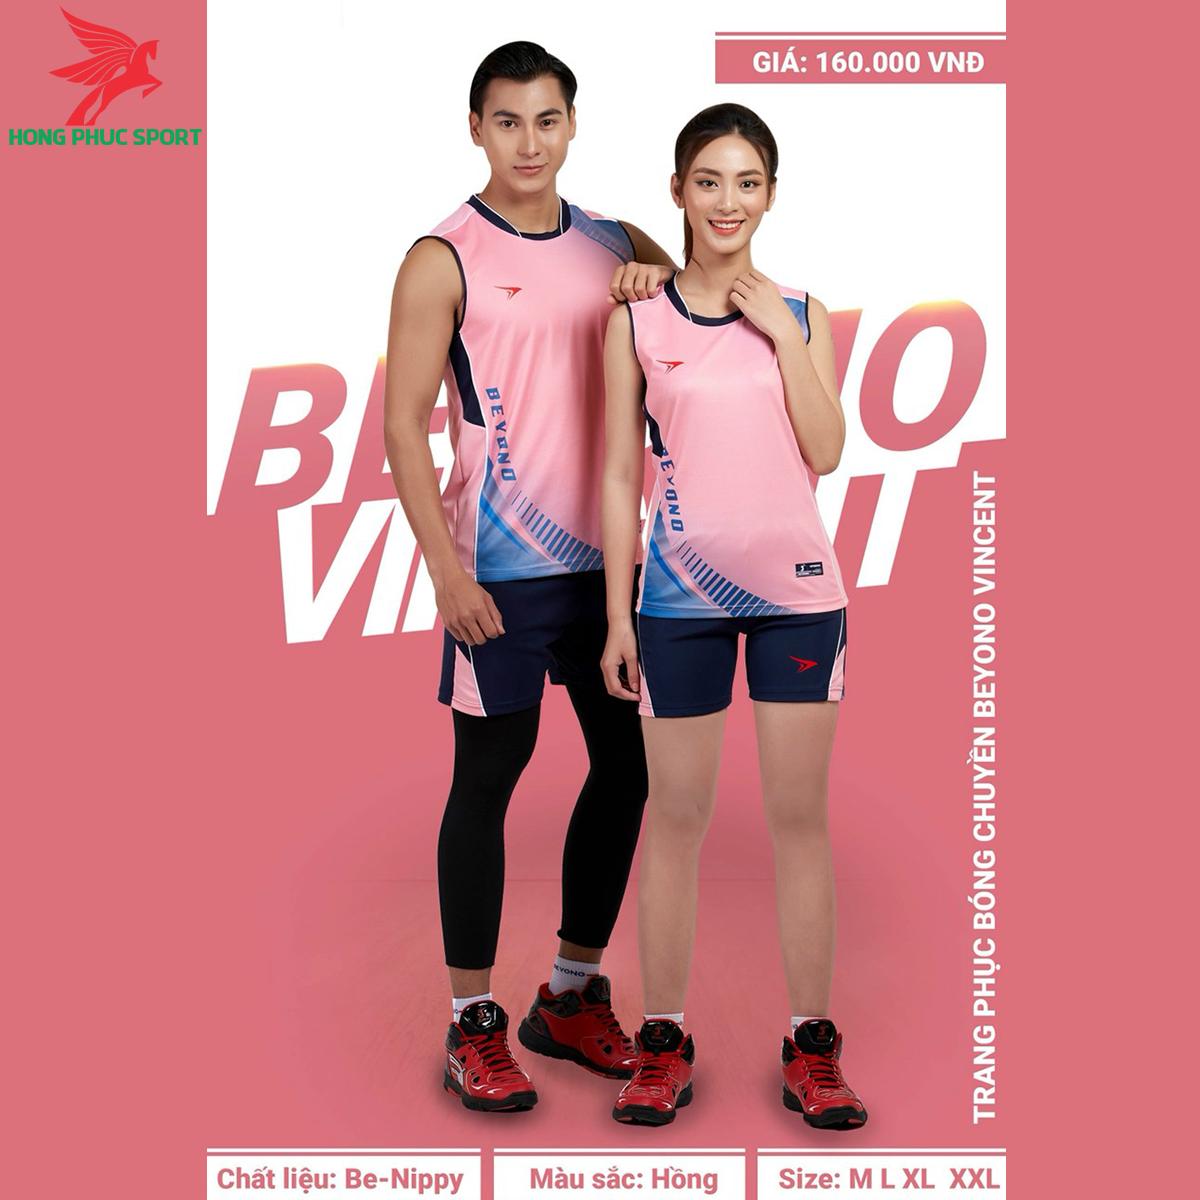 https://cdn.hongphucsport.com/unsafe/s4.shopbay.vn/files/285/ao-bong-chuyen-beyono-vincent-mau-hong-1-6039bfcc812b5.png